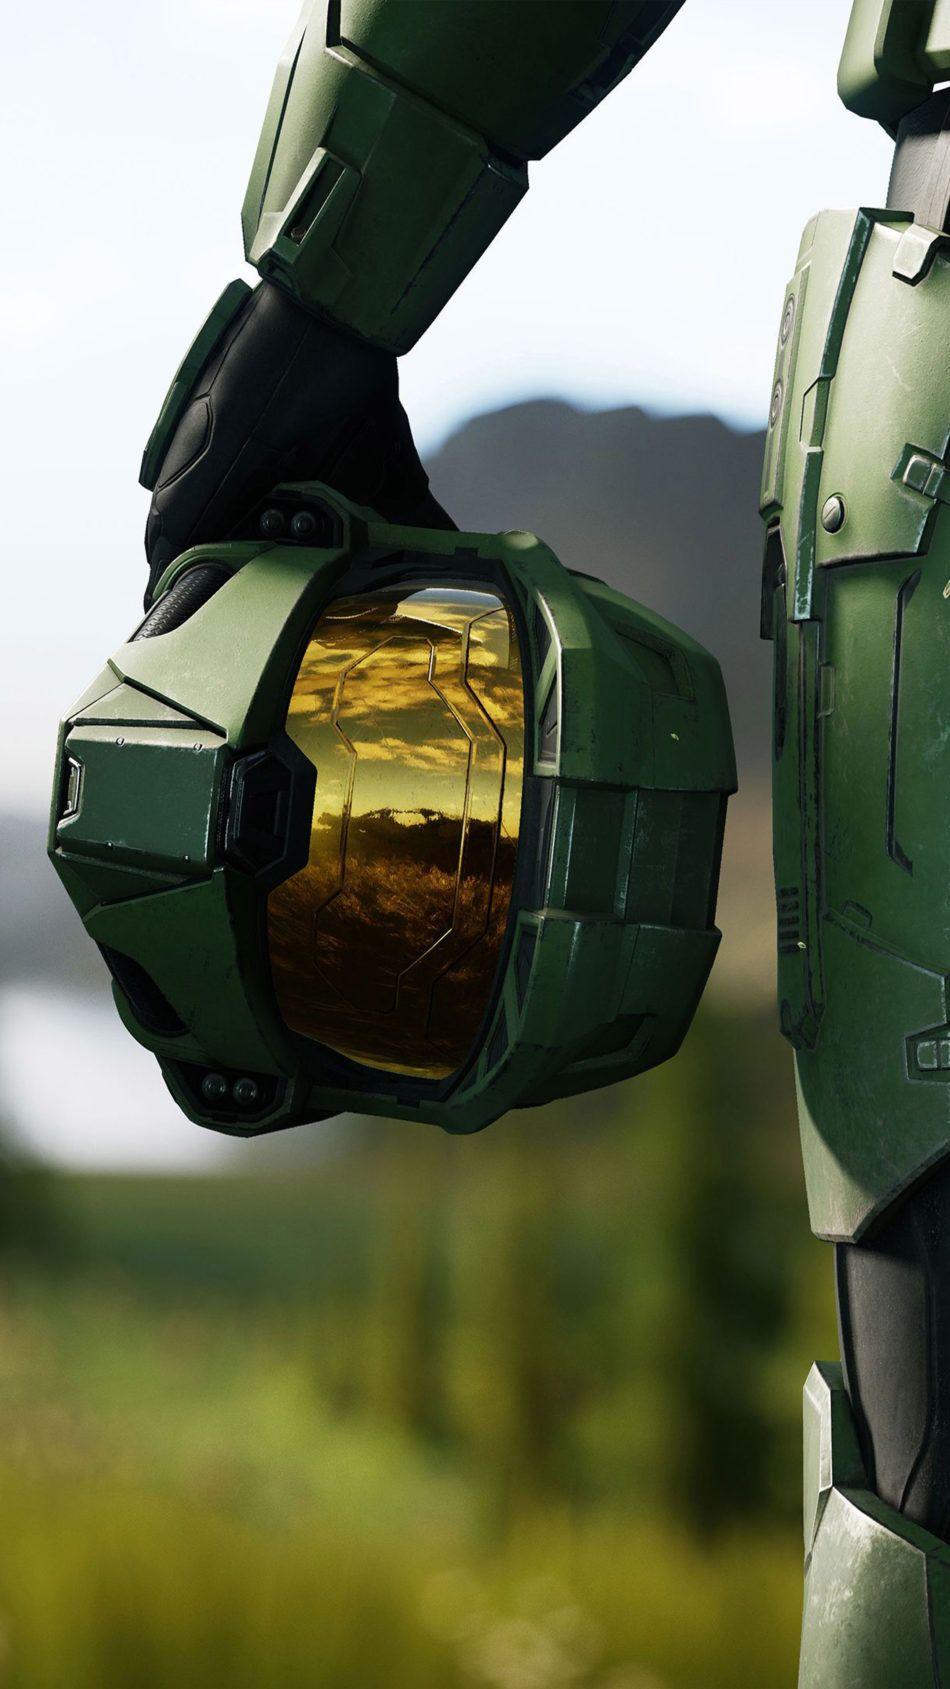 Halo Infinite 2020 Helmet 4k Ultra Hd Mobile Wallpaper Halo Master Chief Halo Armor Halo